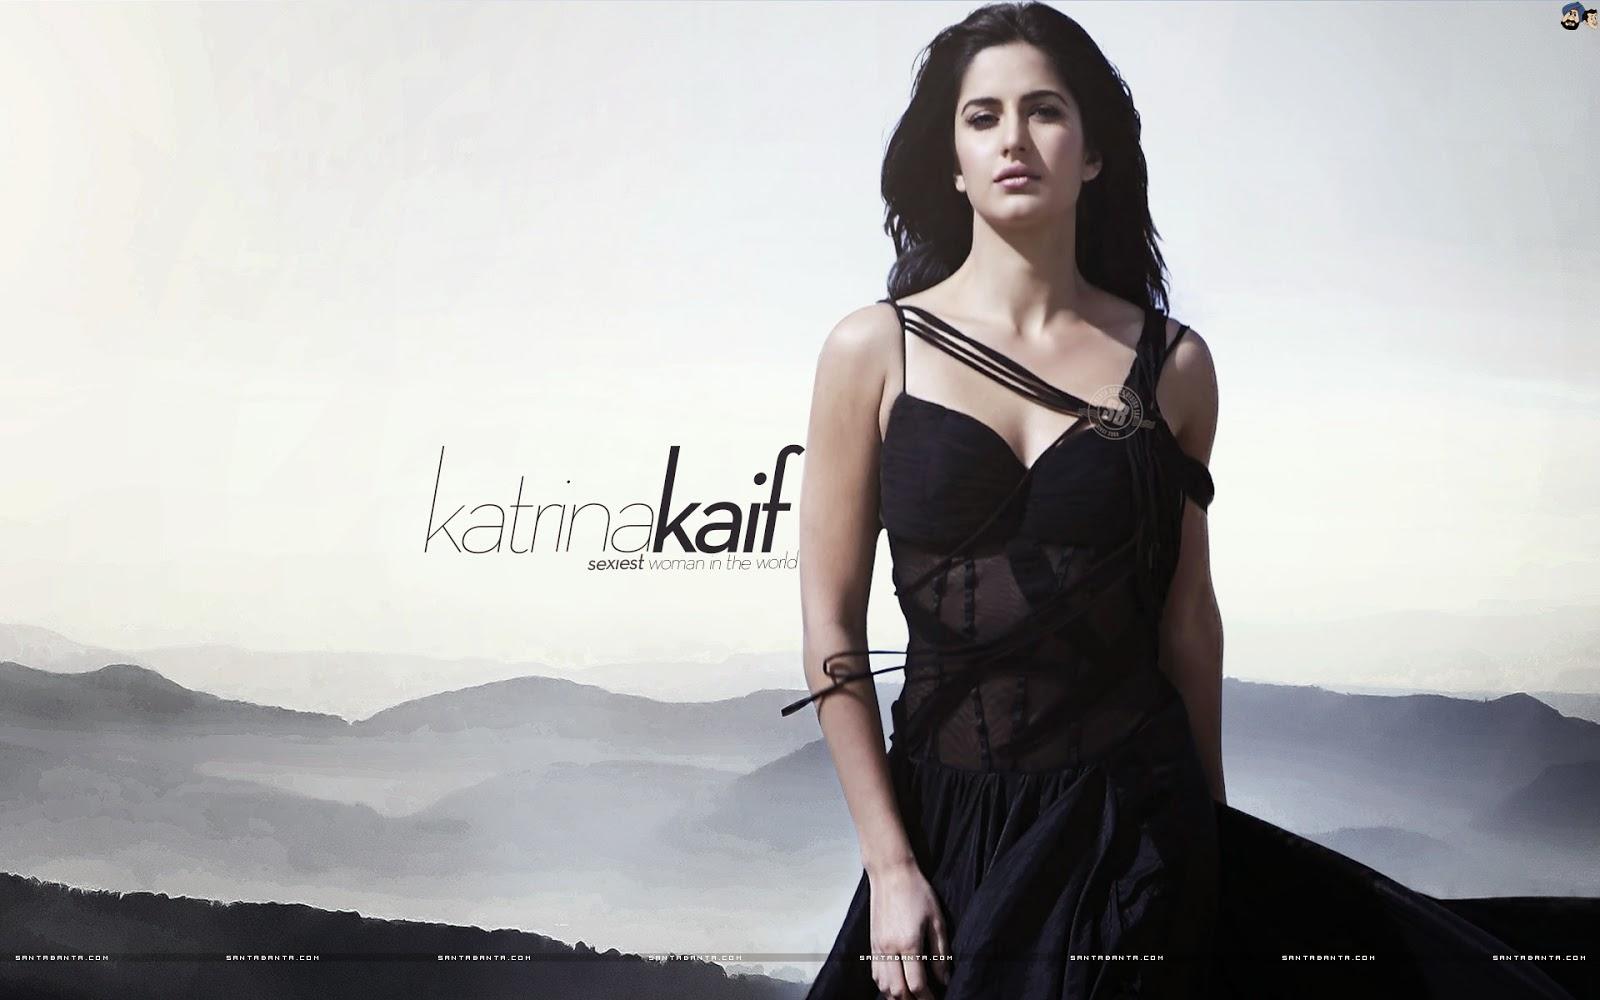 Katrina Kaif Seksi Wallpaper 11